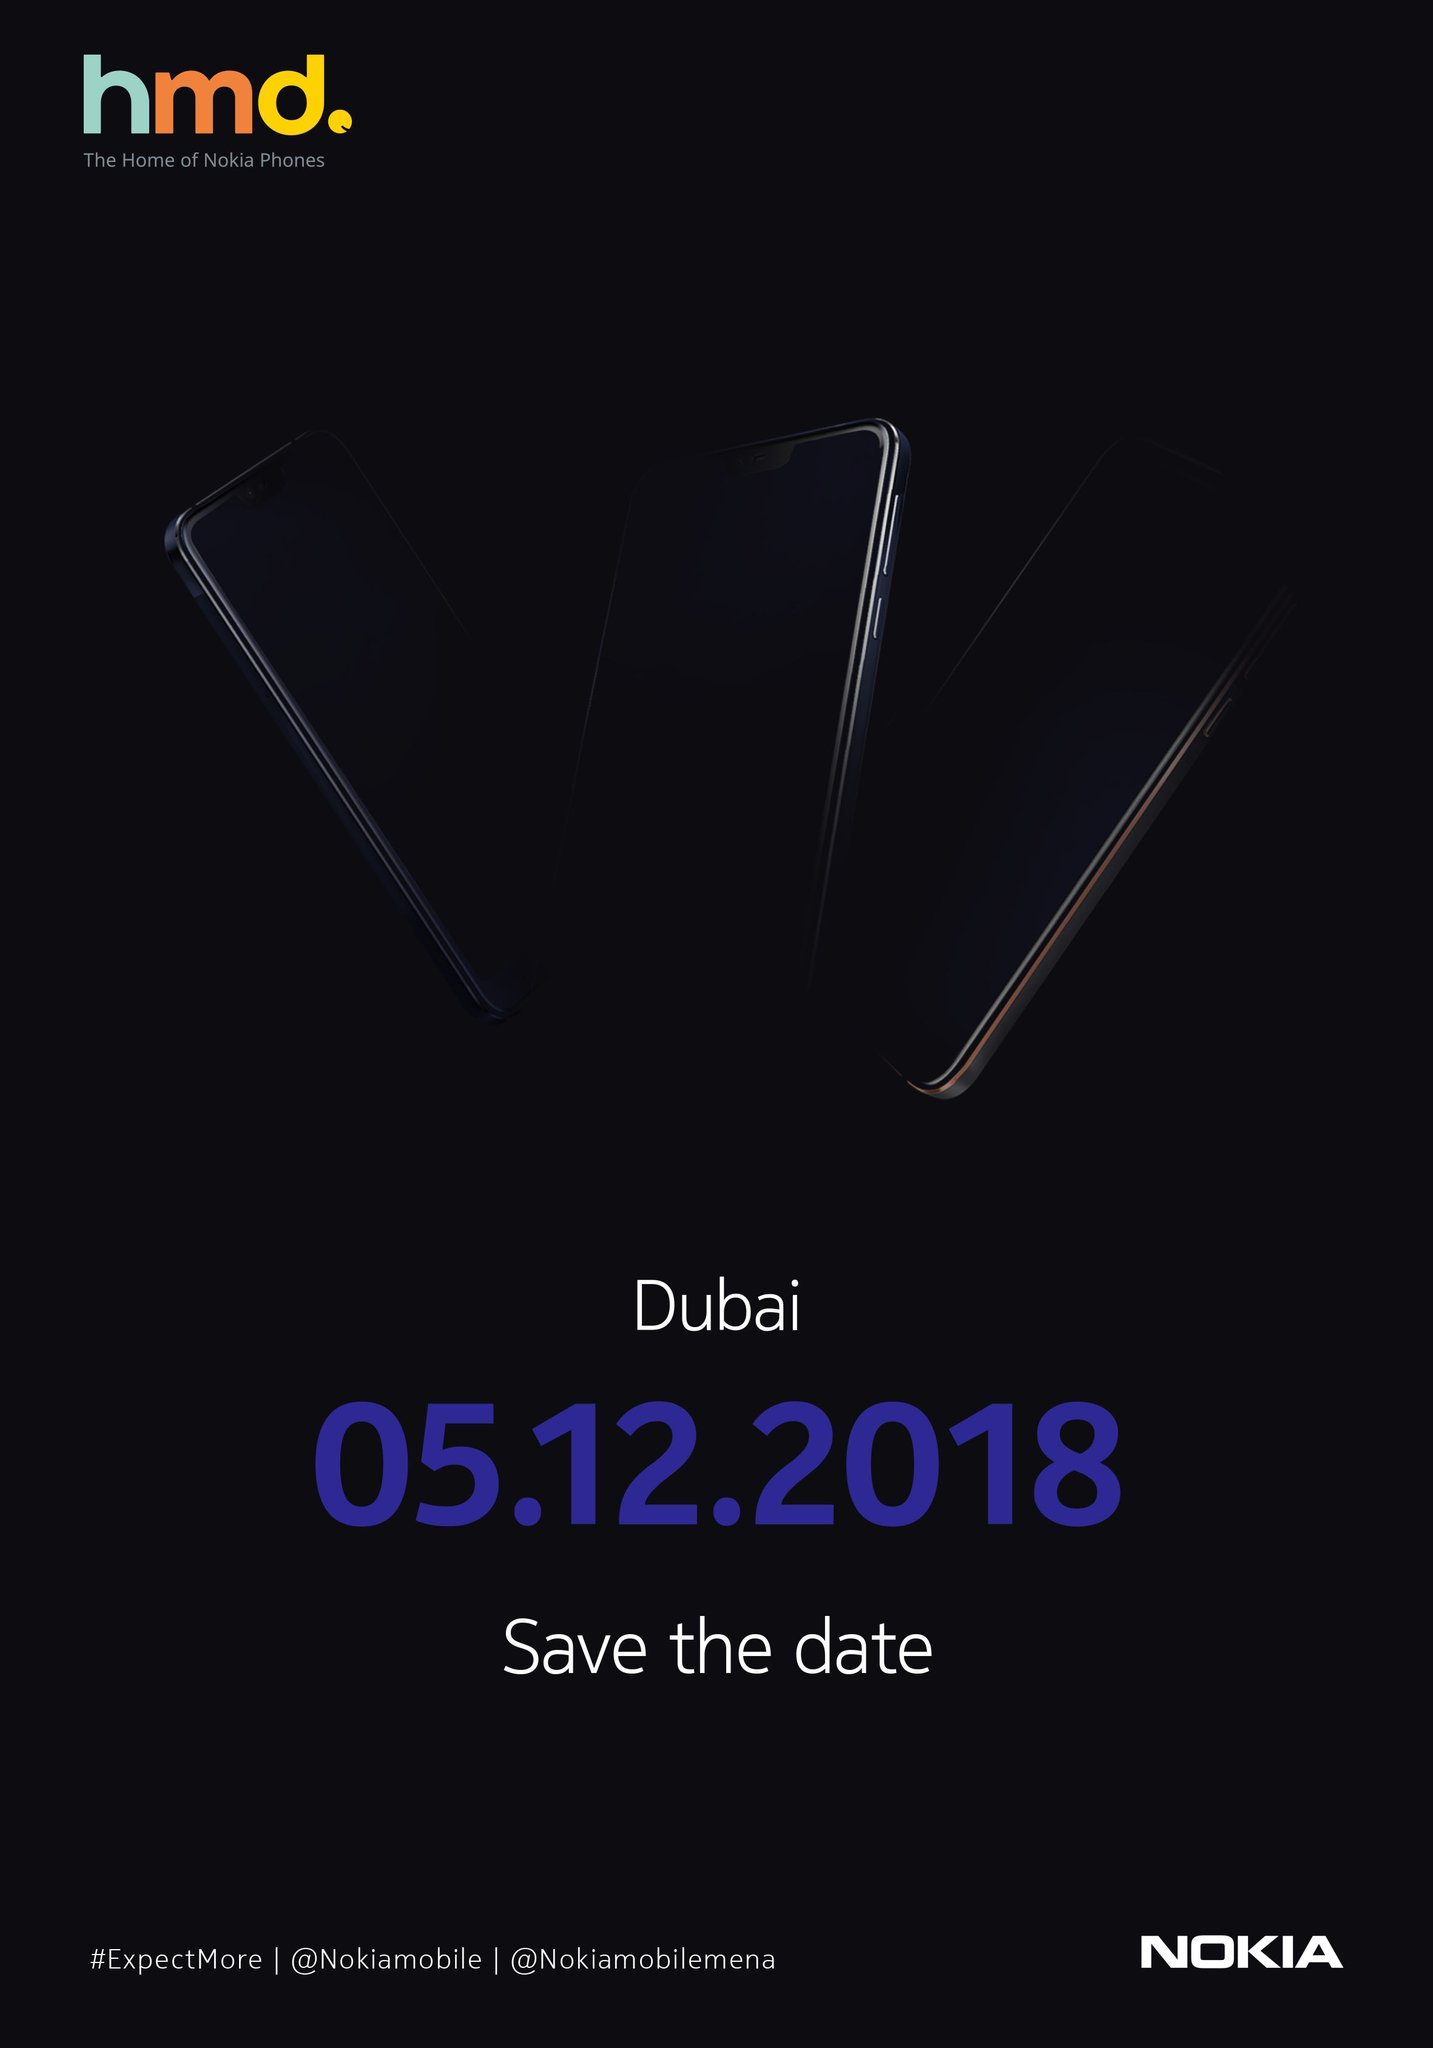 Nokia-Mobile-Dubai-Expect-More.jpg